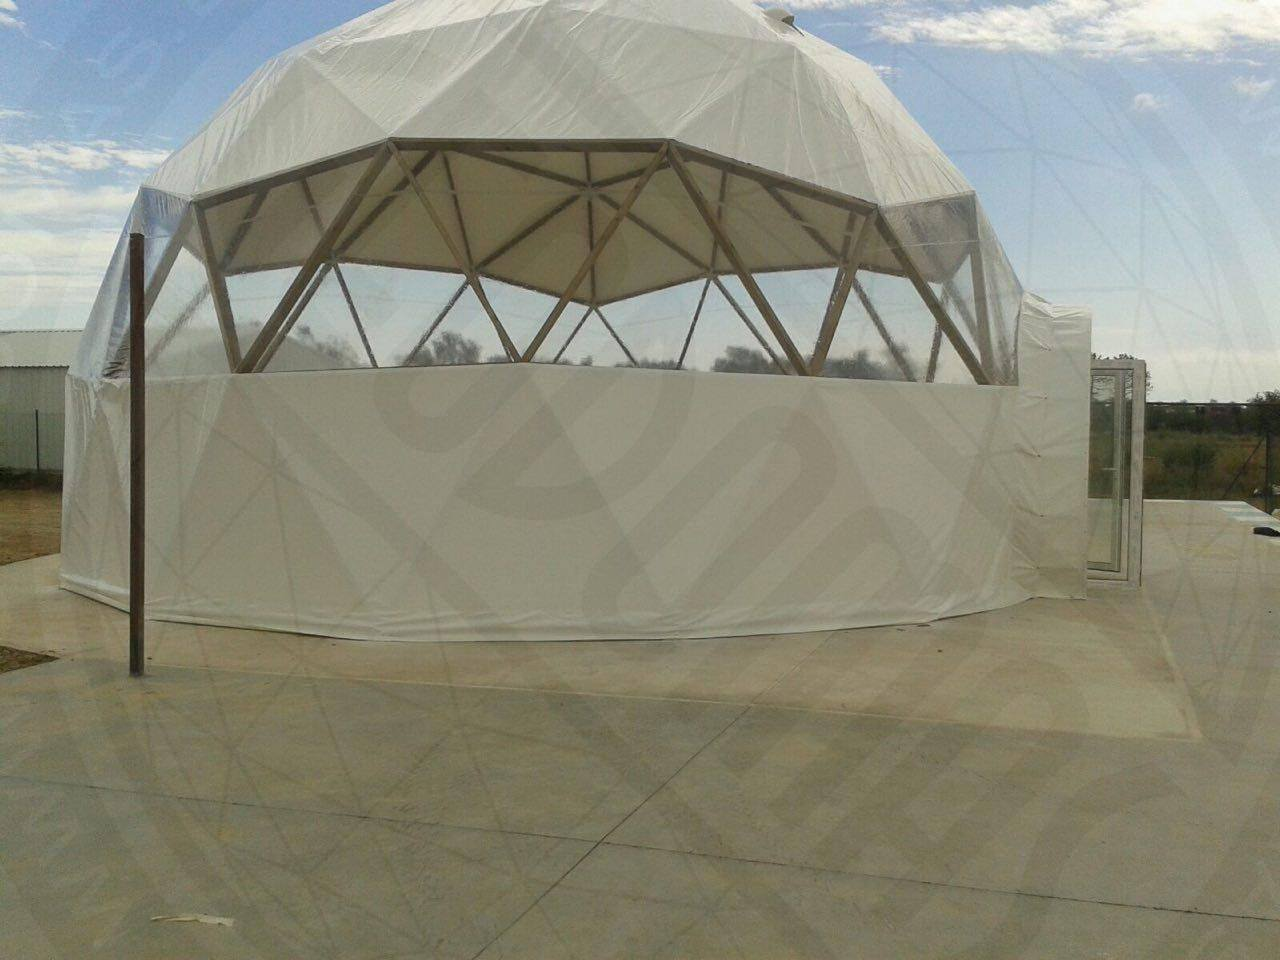 Geodesic Wood Domes Ø8m & 10m, GeoBar For Market   Spain, Girona